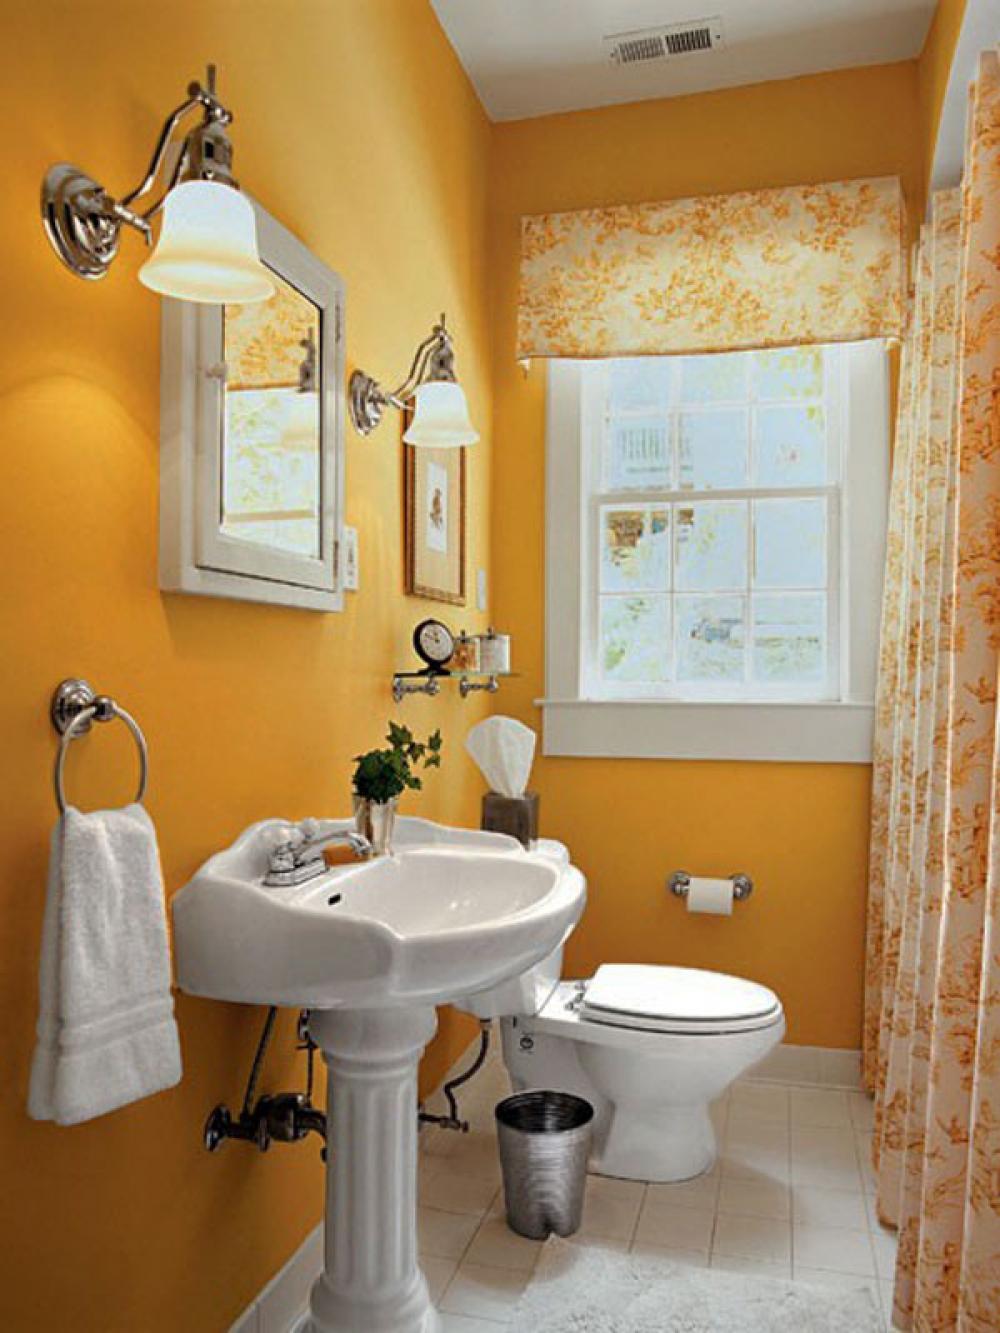 Bathroom Curtains For Small Window Delonho. Yellow Bathroom Window Curtains   Rukinet com